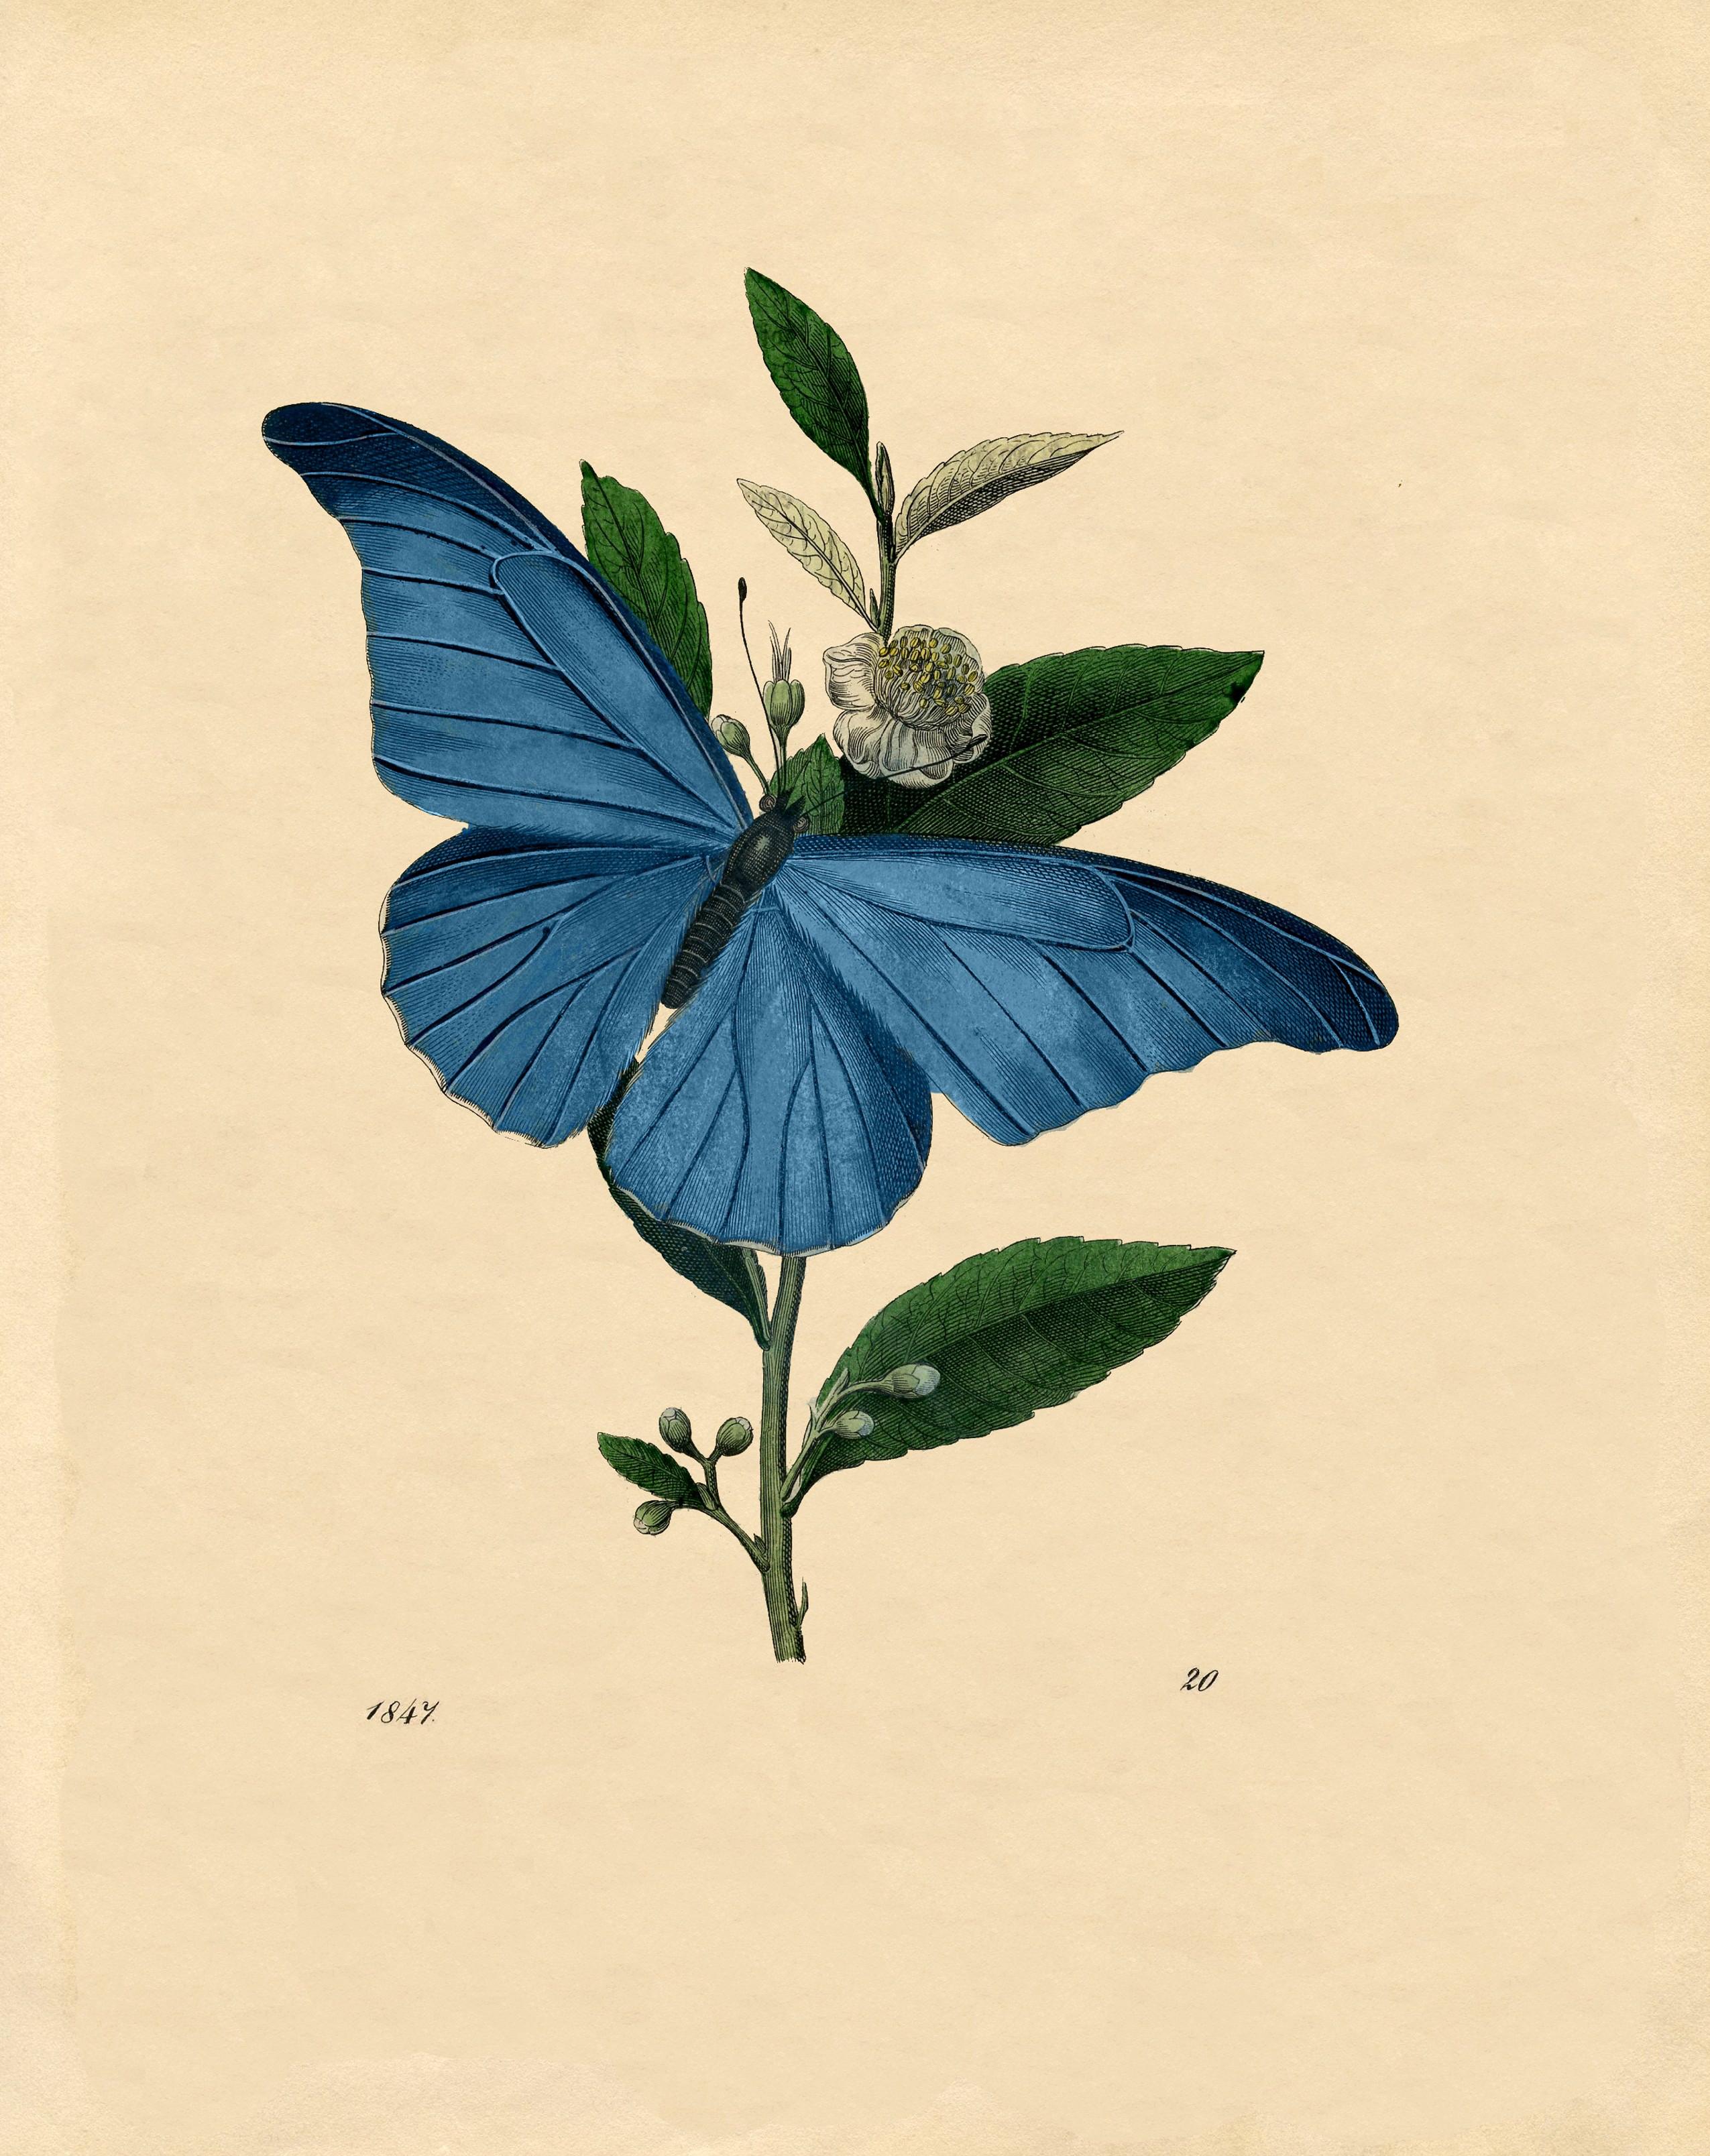 Голубая бабочка - винтажный рисунок